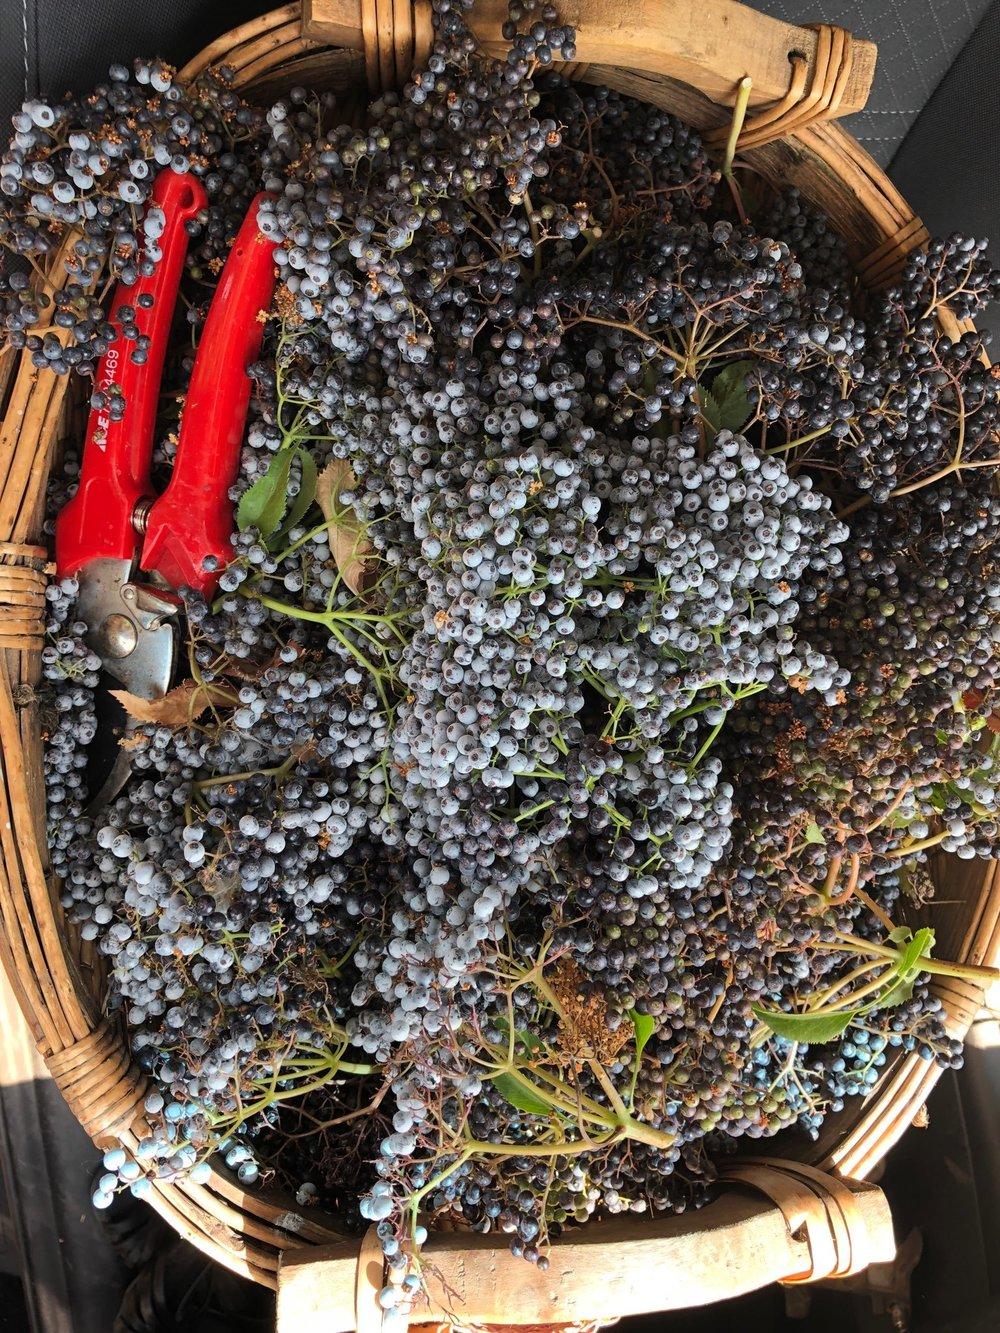 Sustainably foraged elderberries